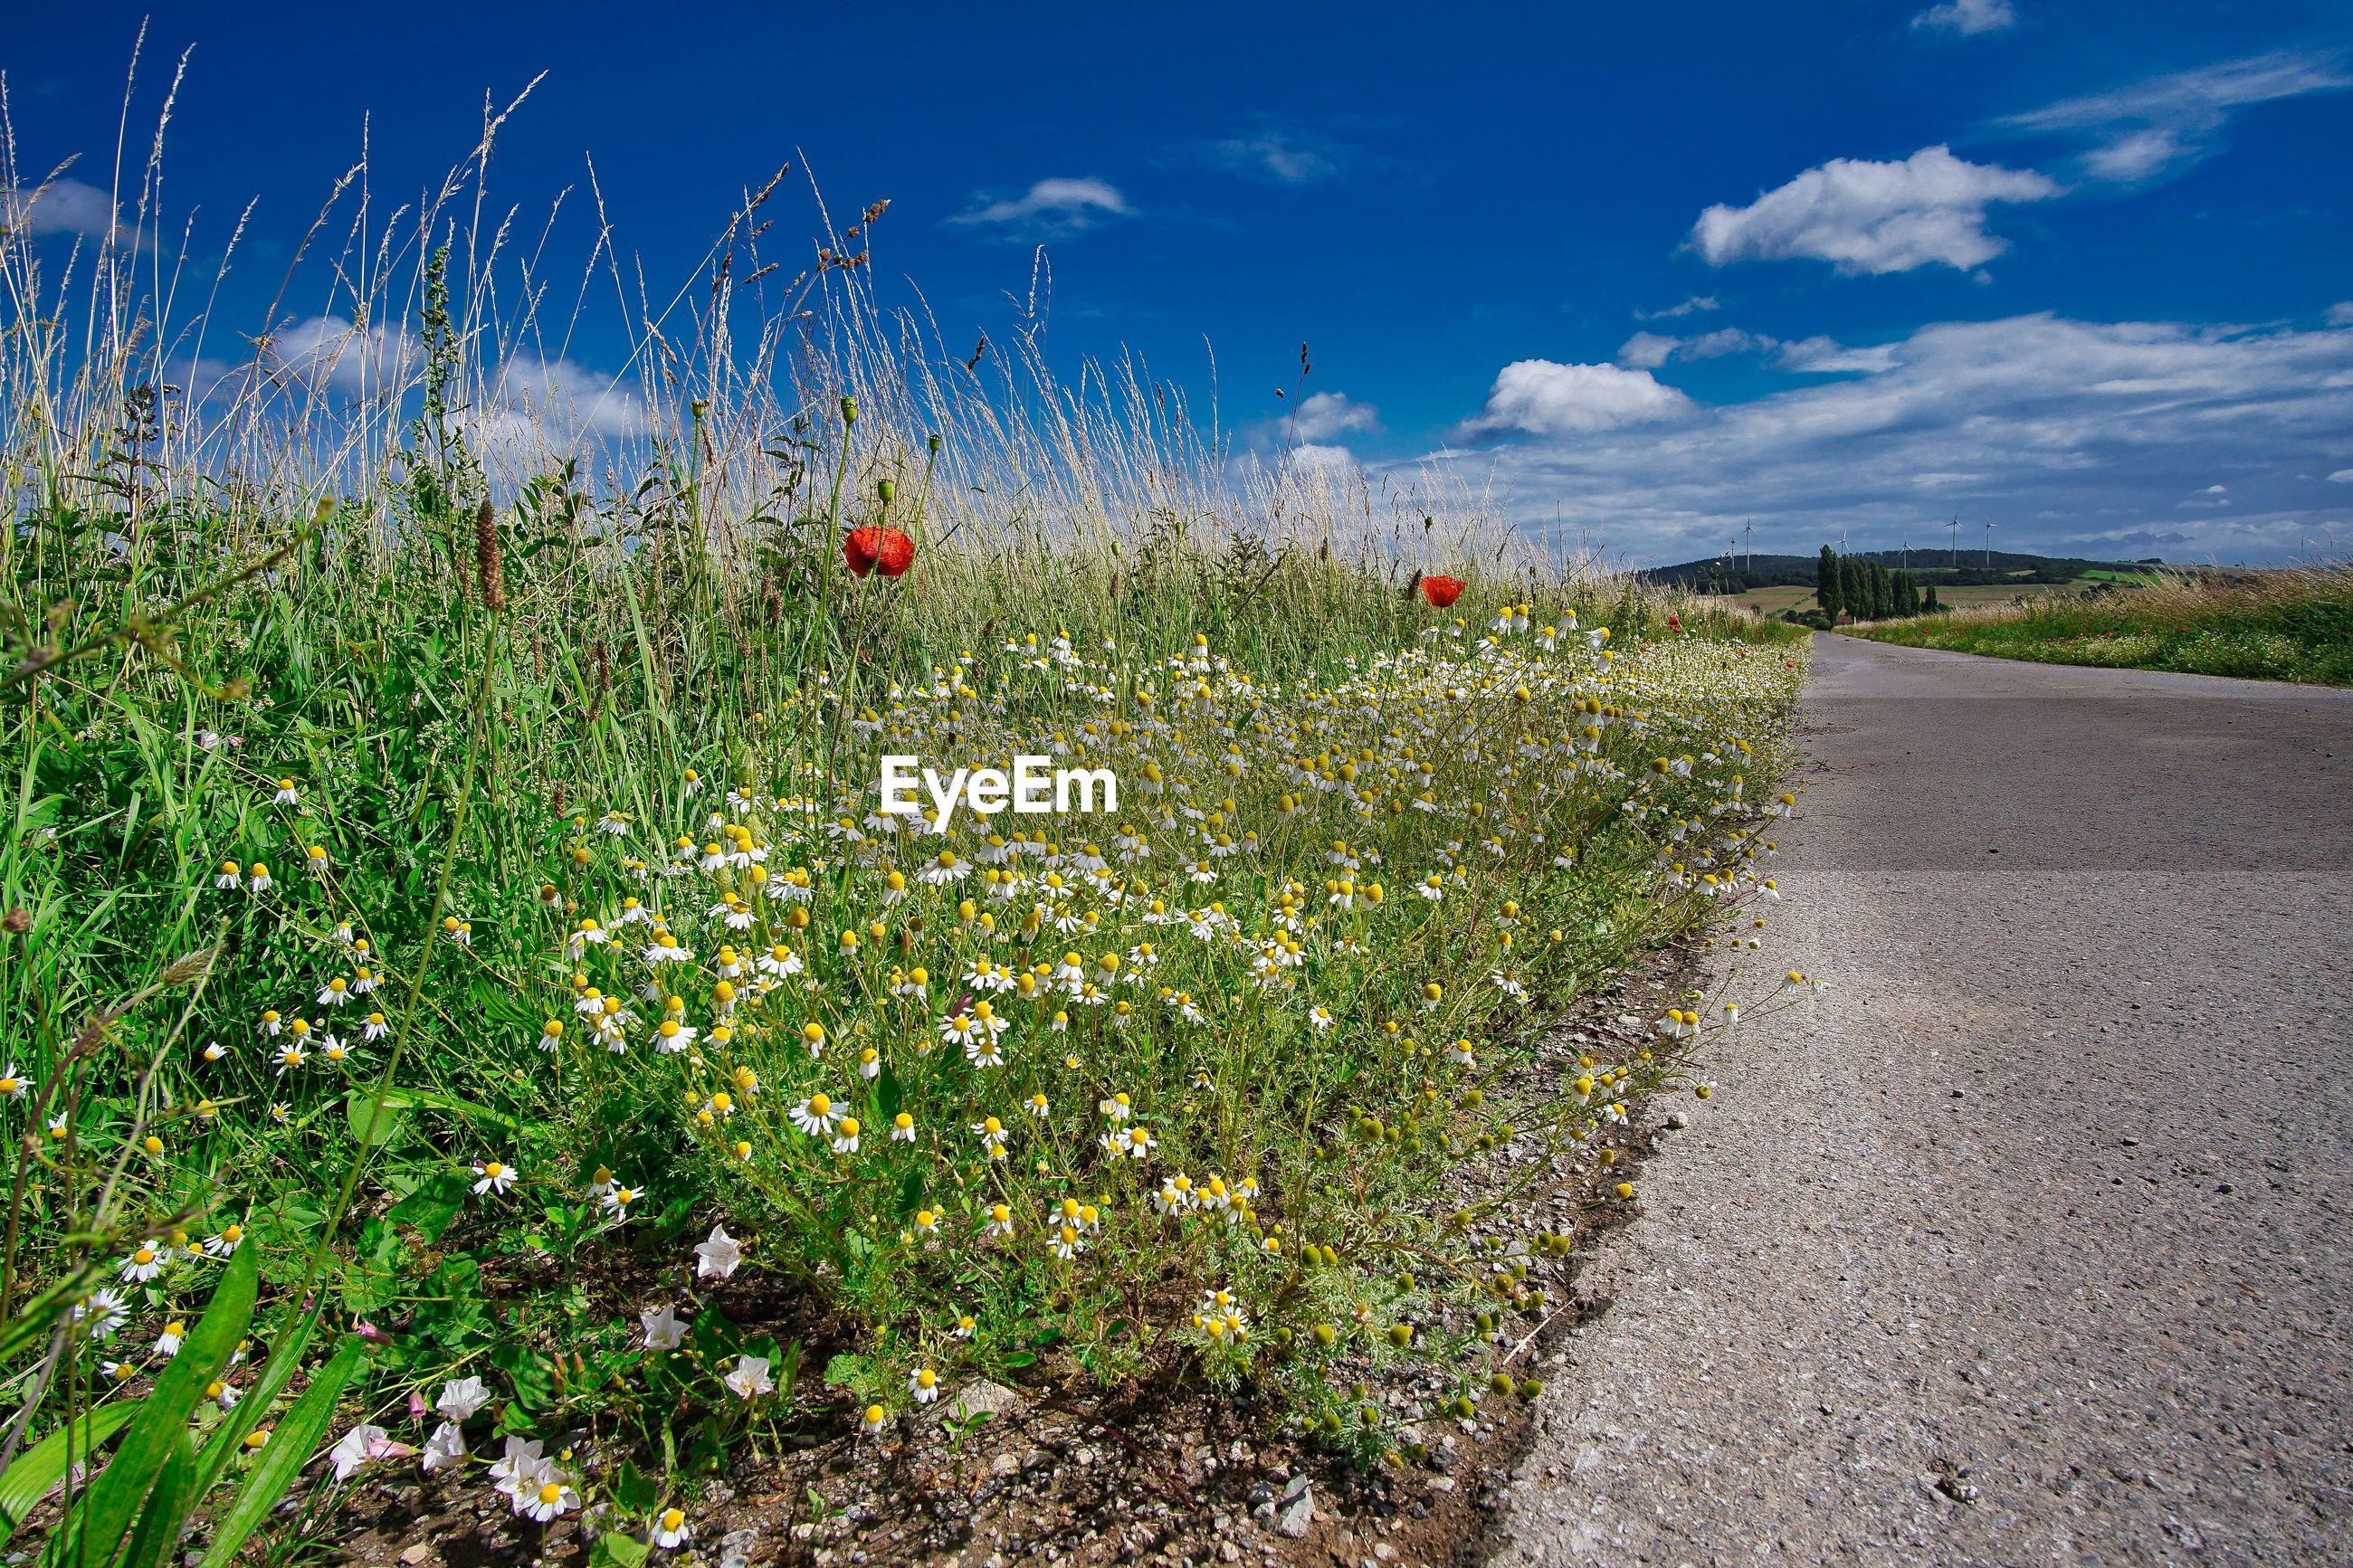 PLANTS GROWING ON FIELD BY ROAD